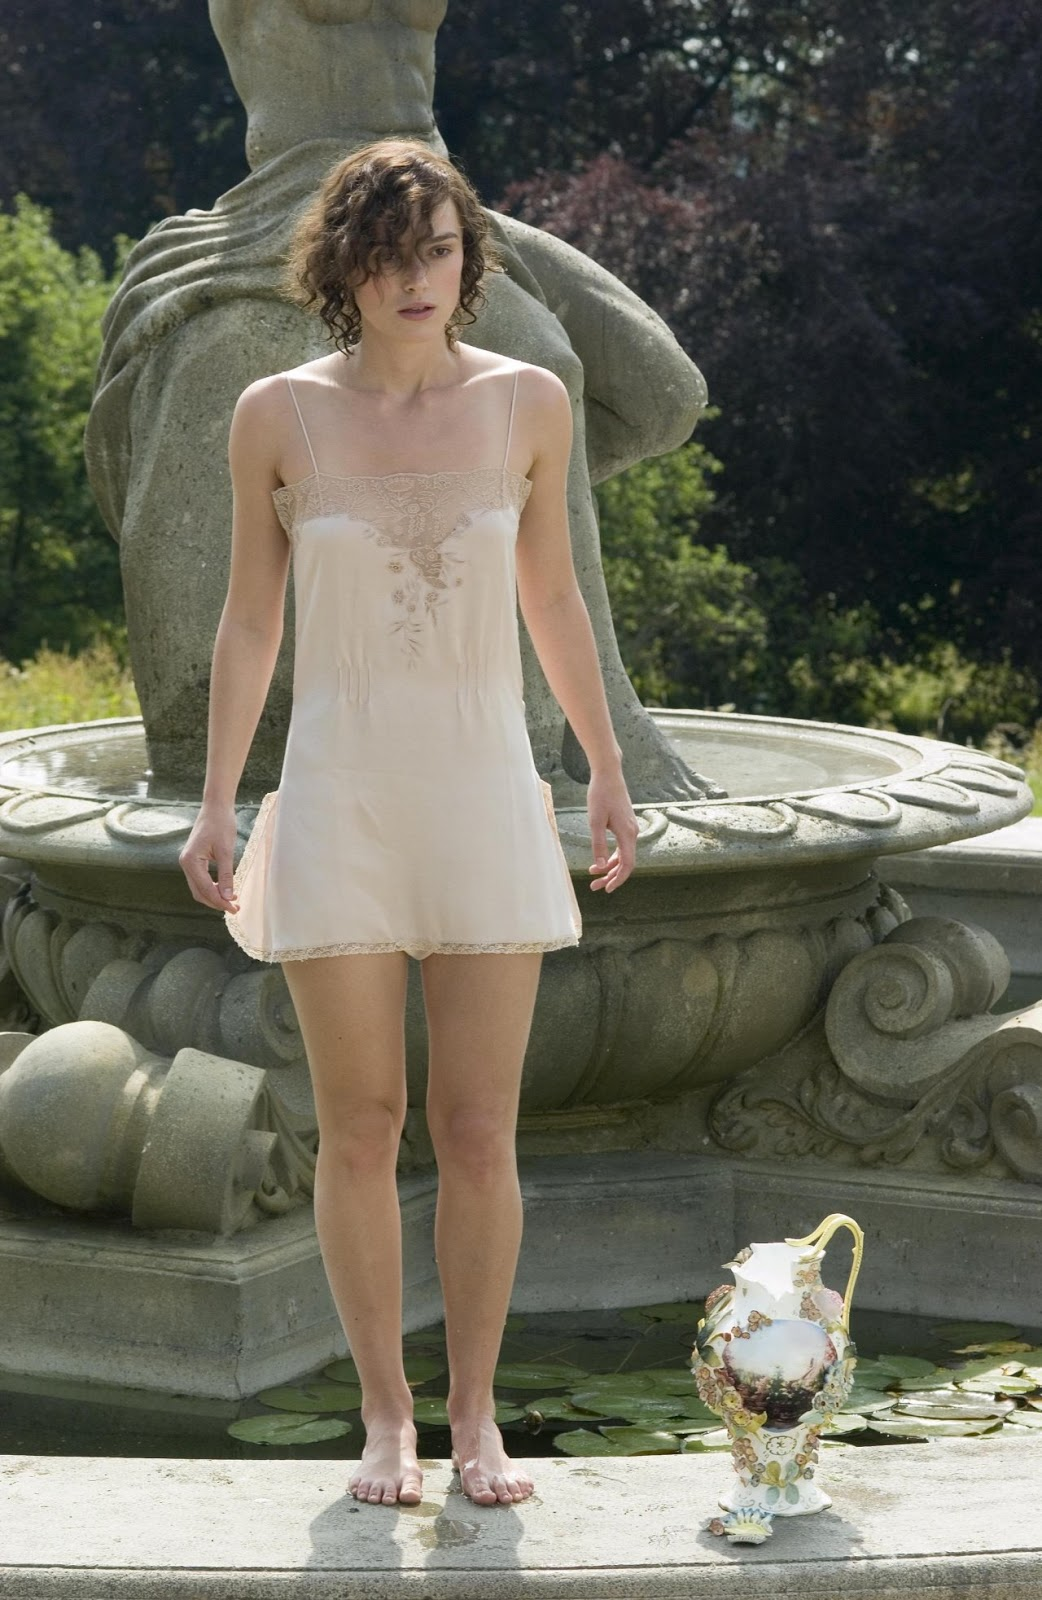 http://4.bp.blogspot.com/-f2H8RXem0xA/ThIS76Rx5JI/AAAAAAAAAPw/yfKIoisoPFs/s1600/Keira-Knightley-Feet-215623.jpg